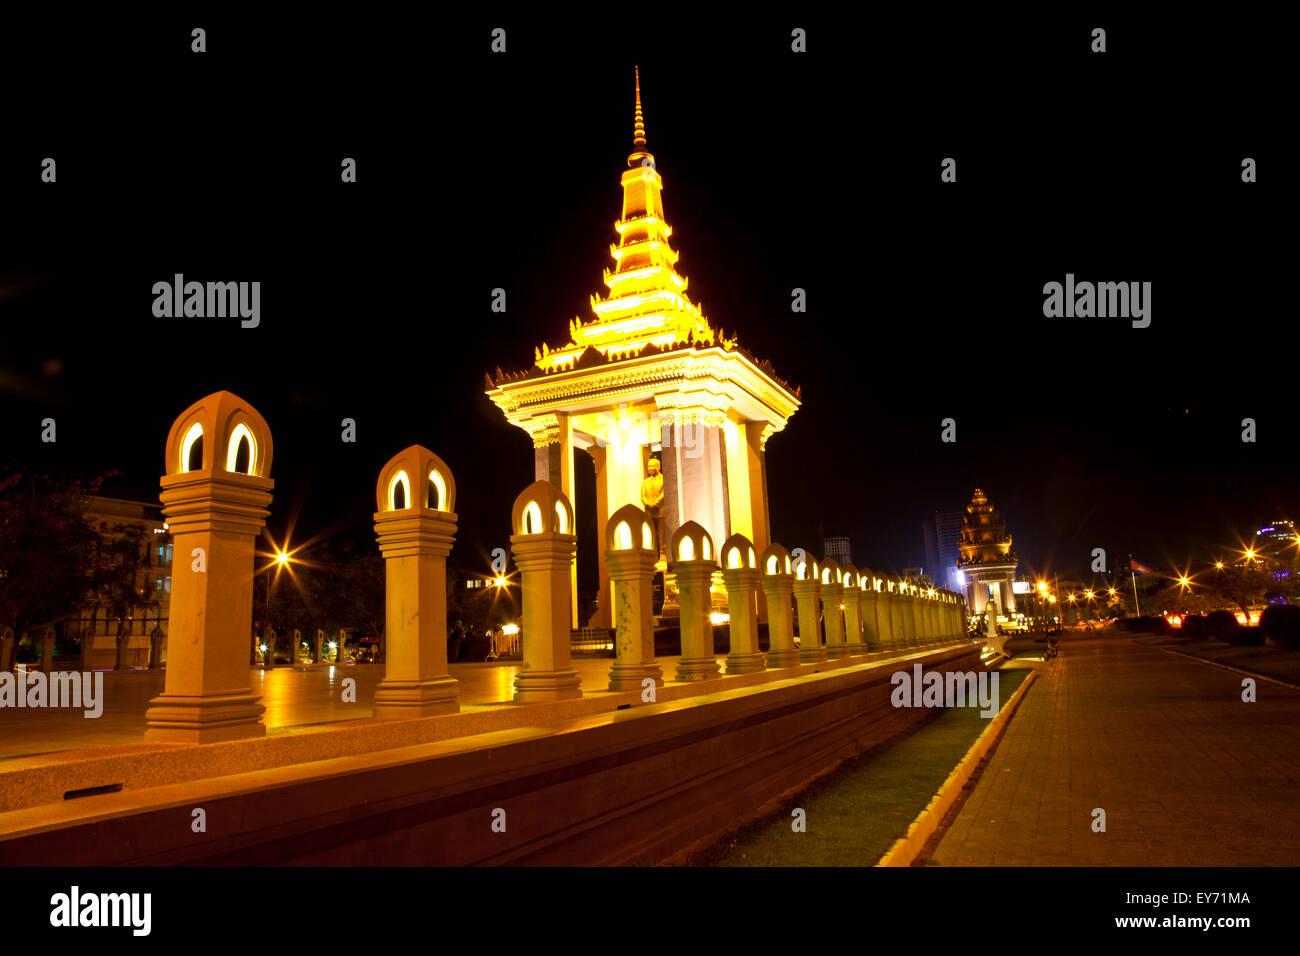 King Norodom Sihanouk Statue Stock Photo